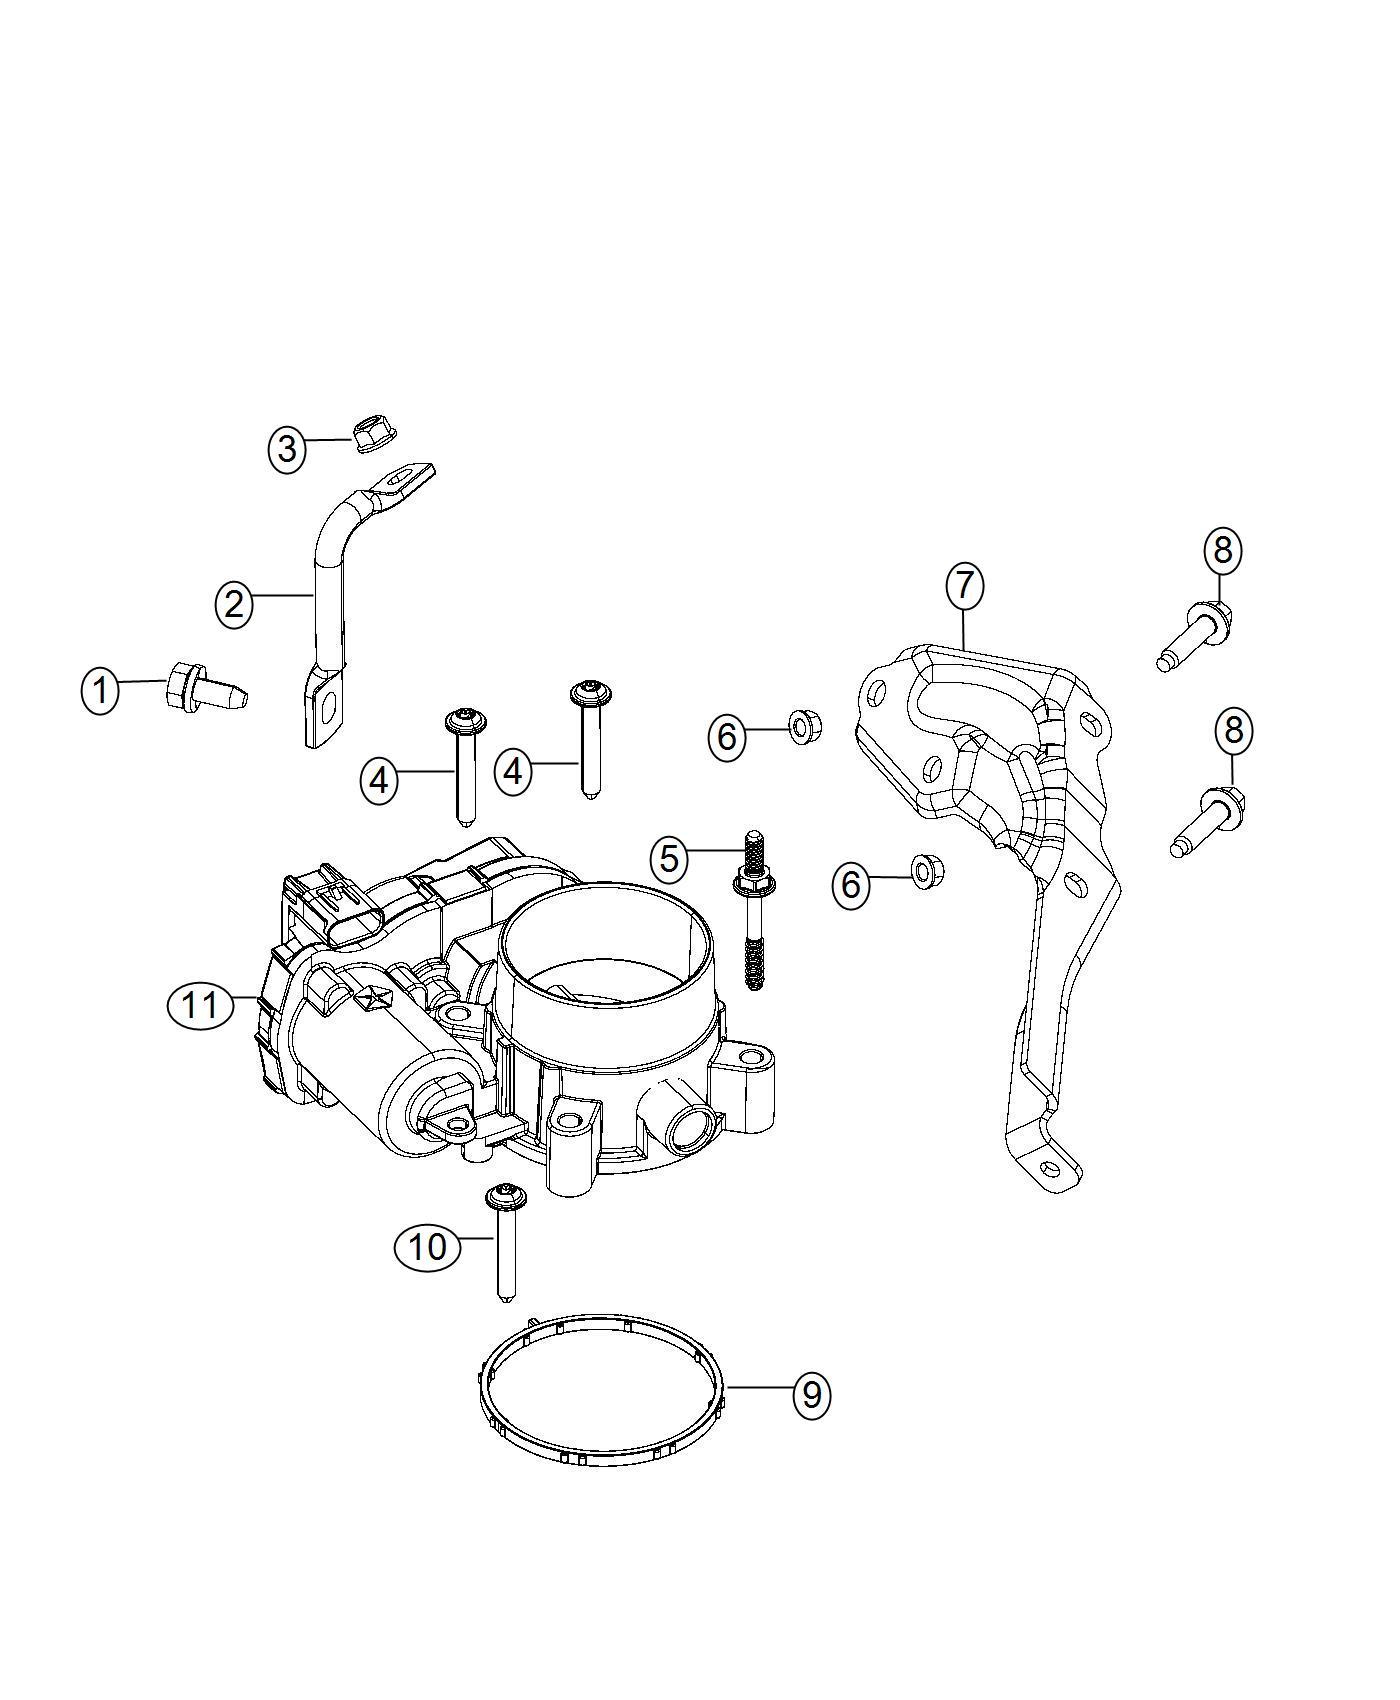 Jeep Cherokee Throttle Body Export Engine Multiair